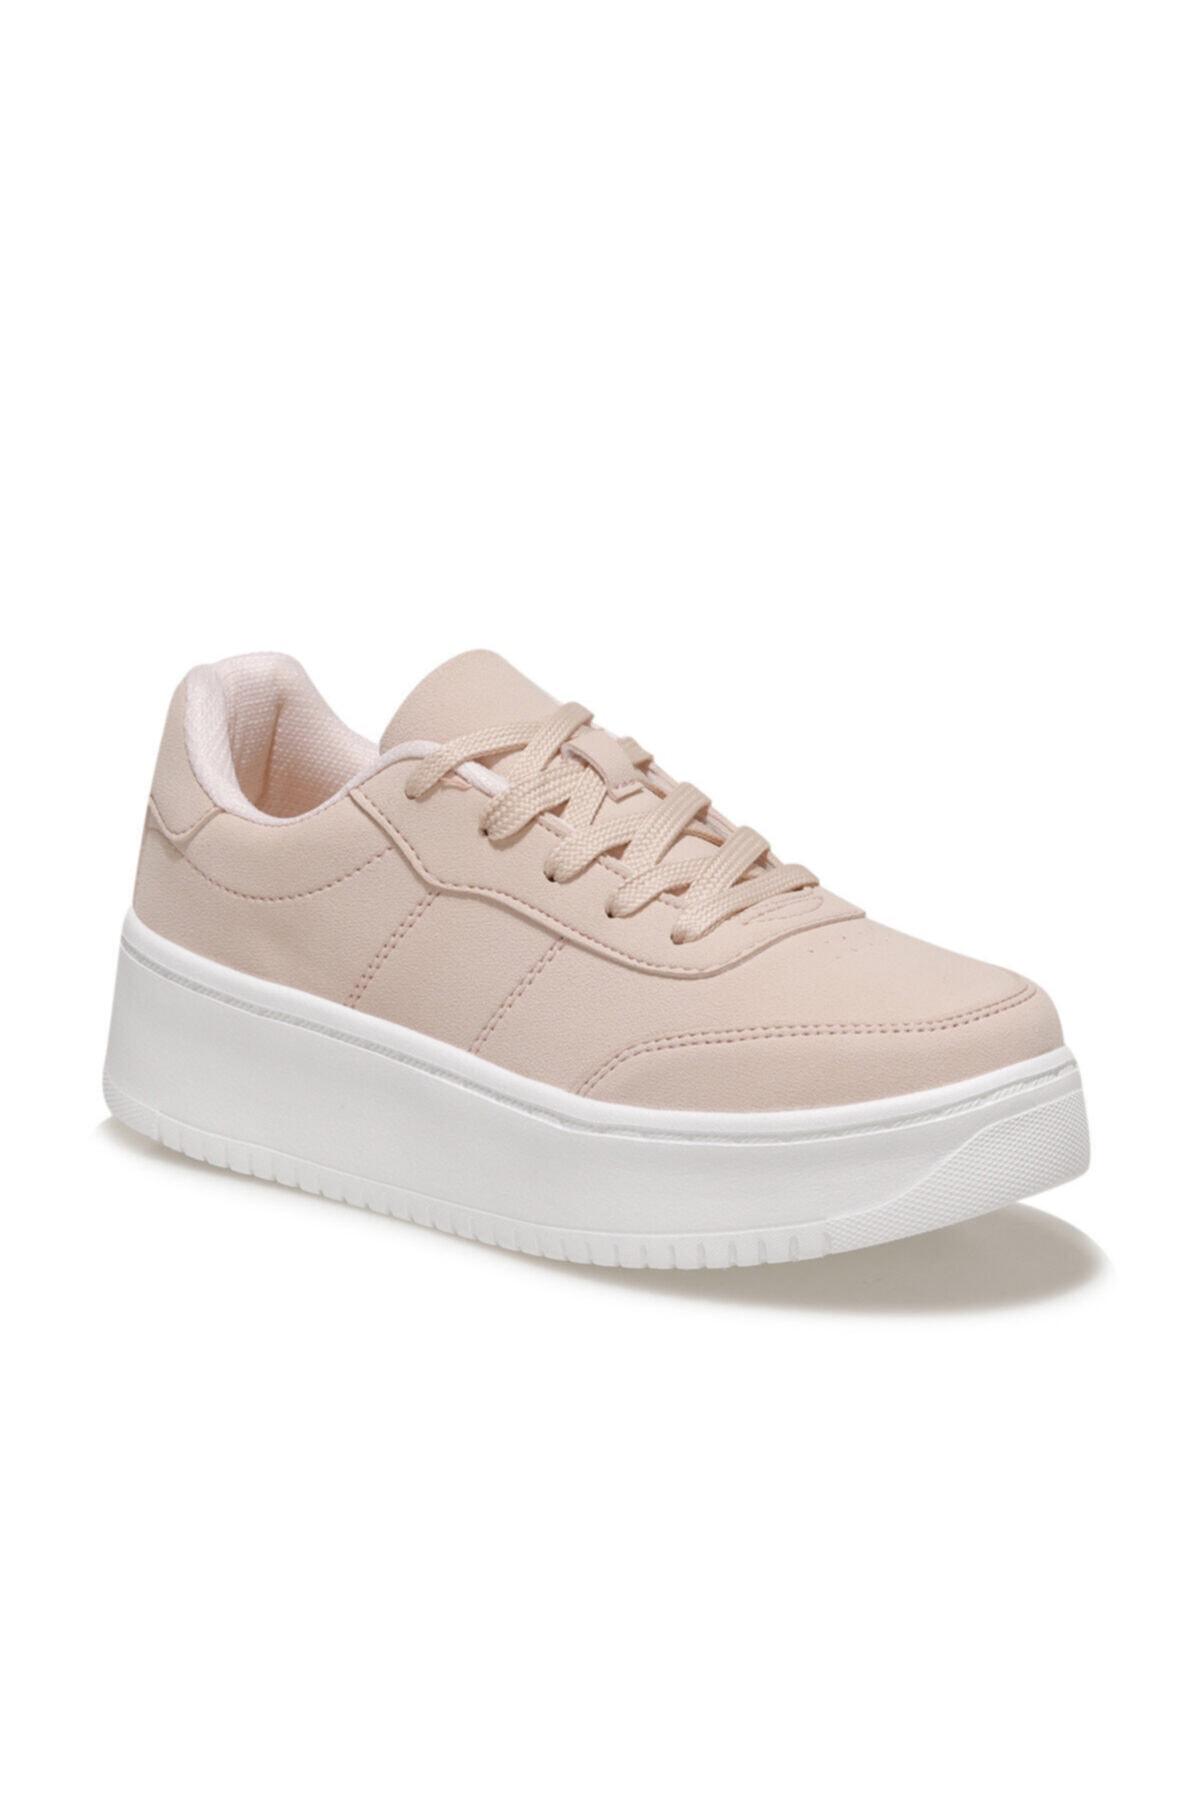 LIZA 1FX Pembe Kadın Havuz Taban Sneaker 100586943